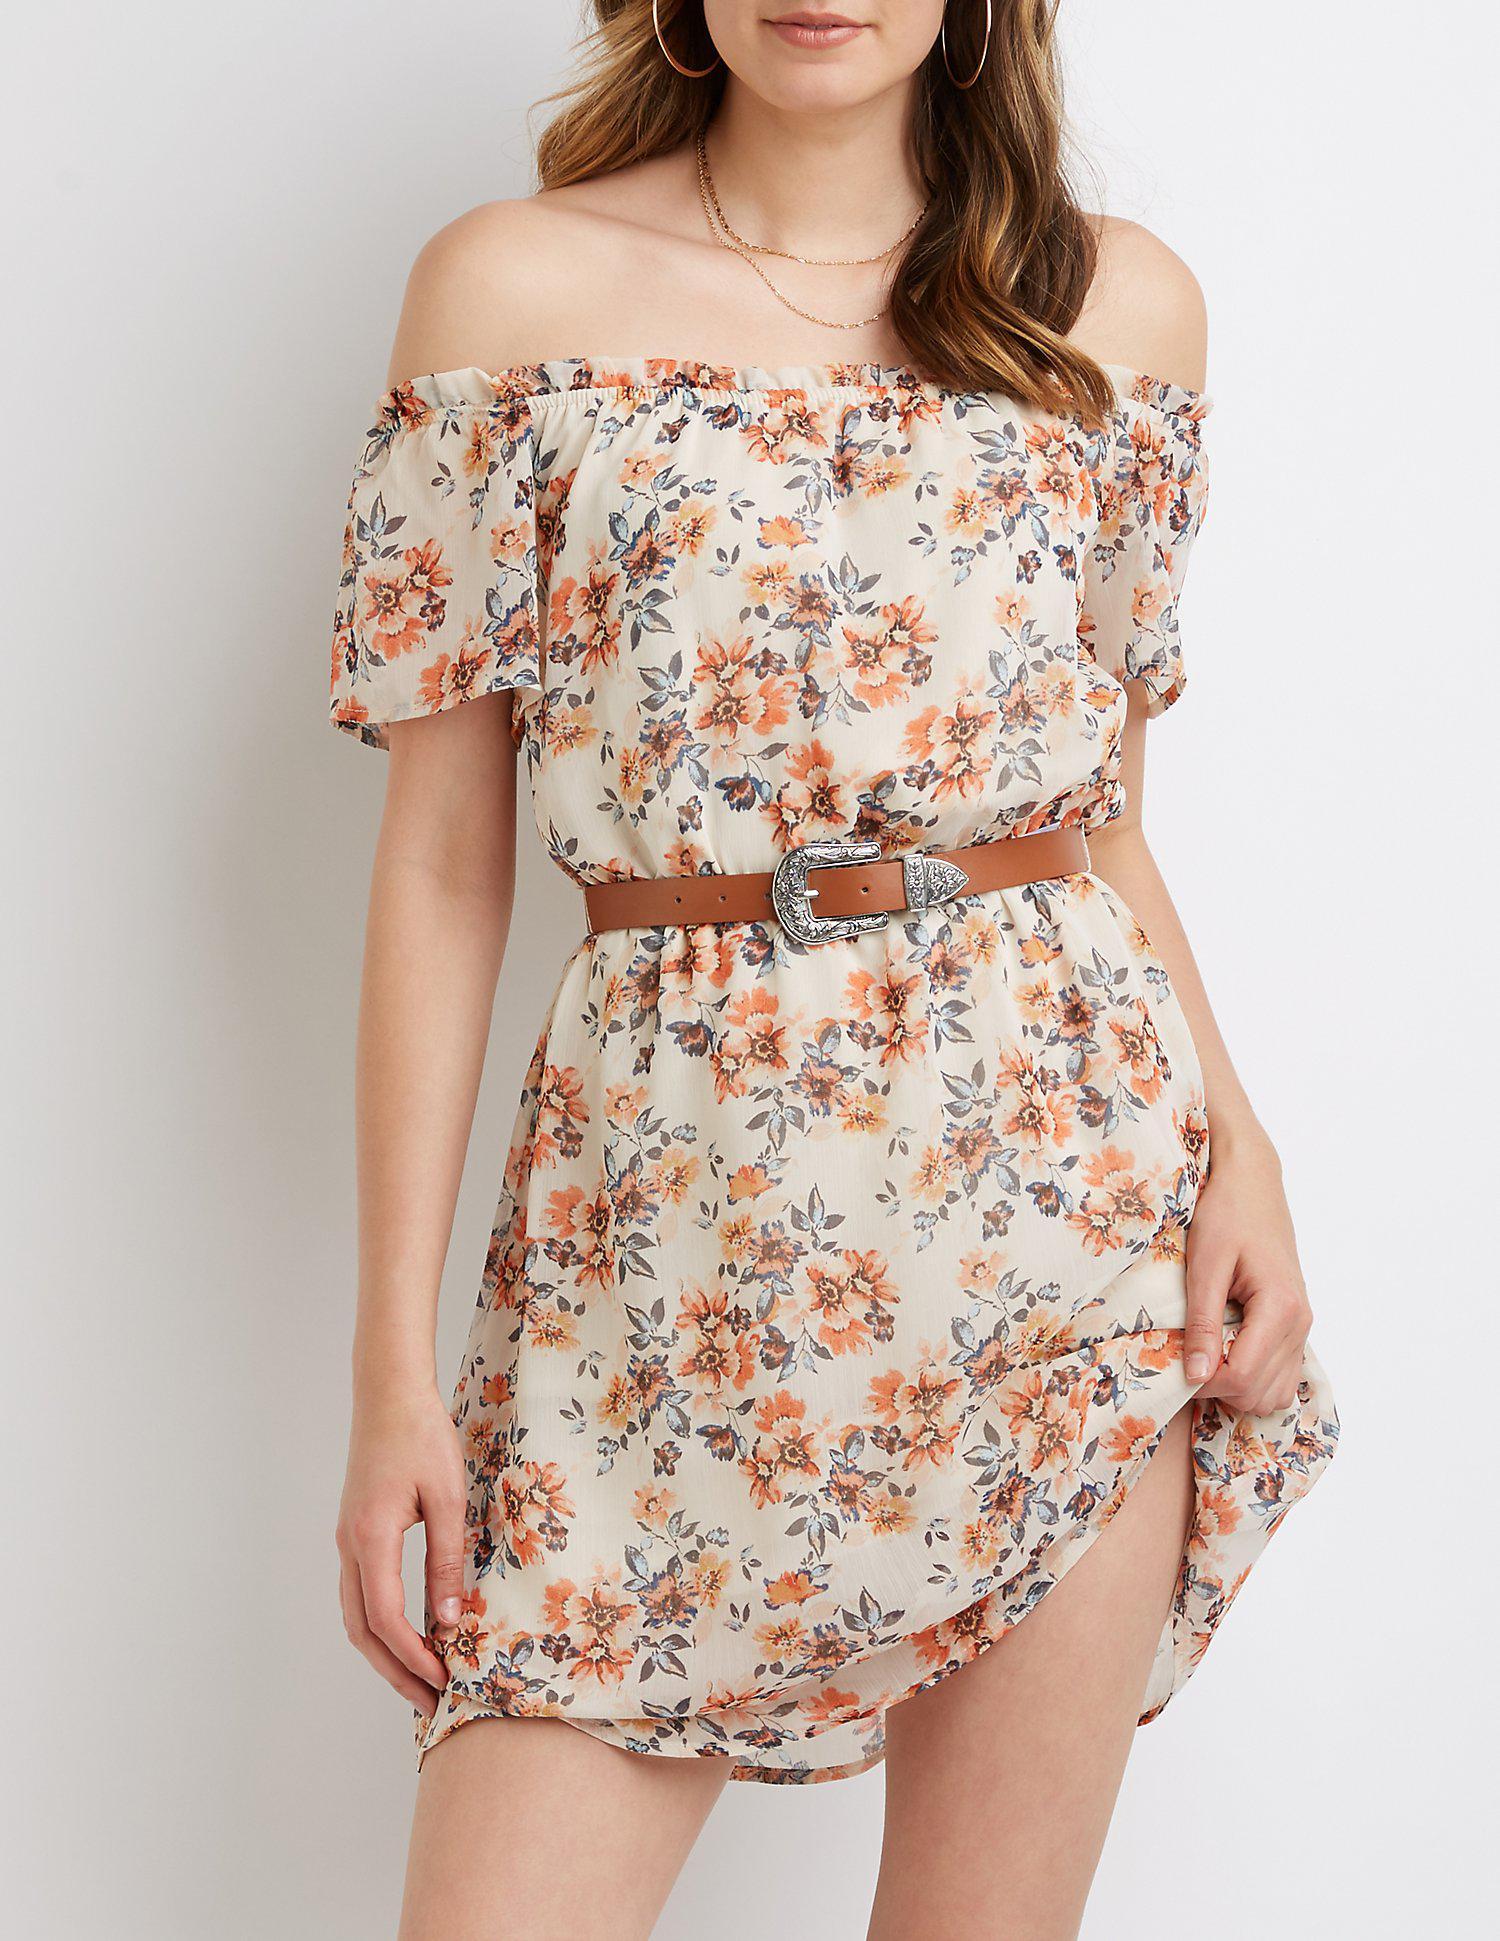 83d18d2d50f Lyst - Charlotte Russe Floral Off The Shoulder Dress